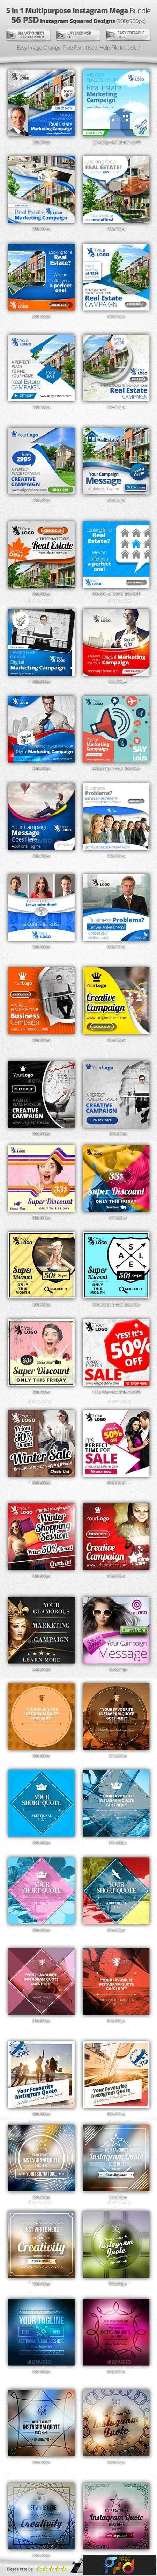 freepsdvn-com_1440481823_56-instagram-design-templates-5-in-1-bundle-12487586